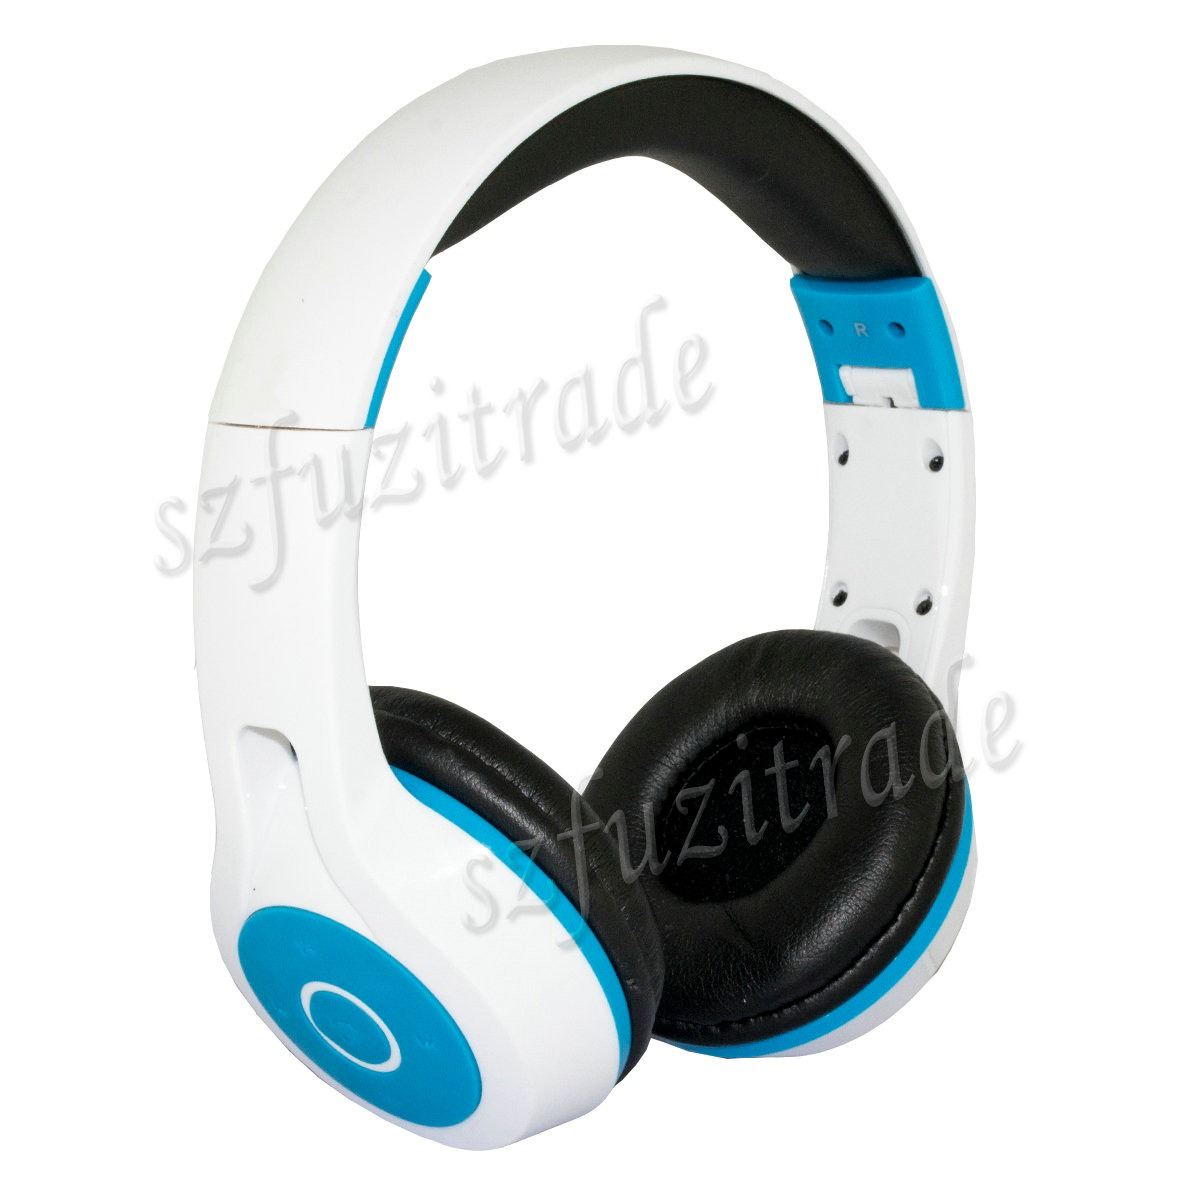 komc wireless bluetooth 3 5mm jack stereo headphones headset w volume control us ebay. Black Bedroom Furniture Sets. Home Design Ideas